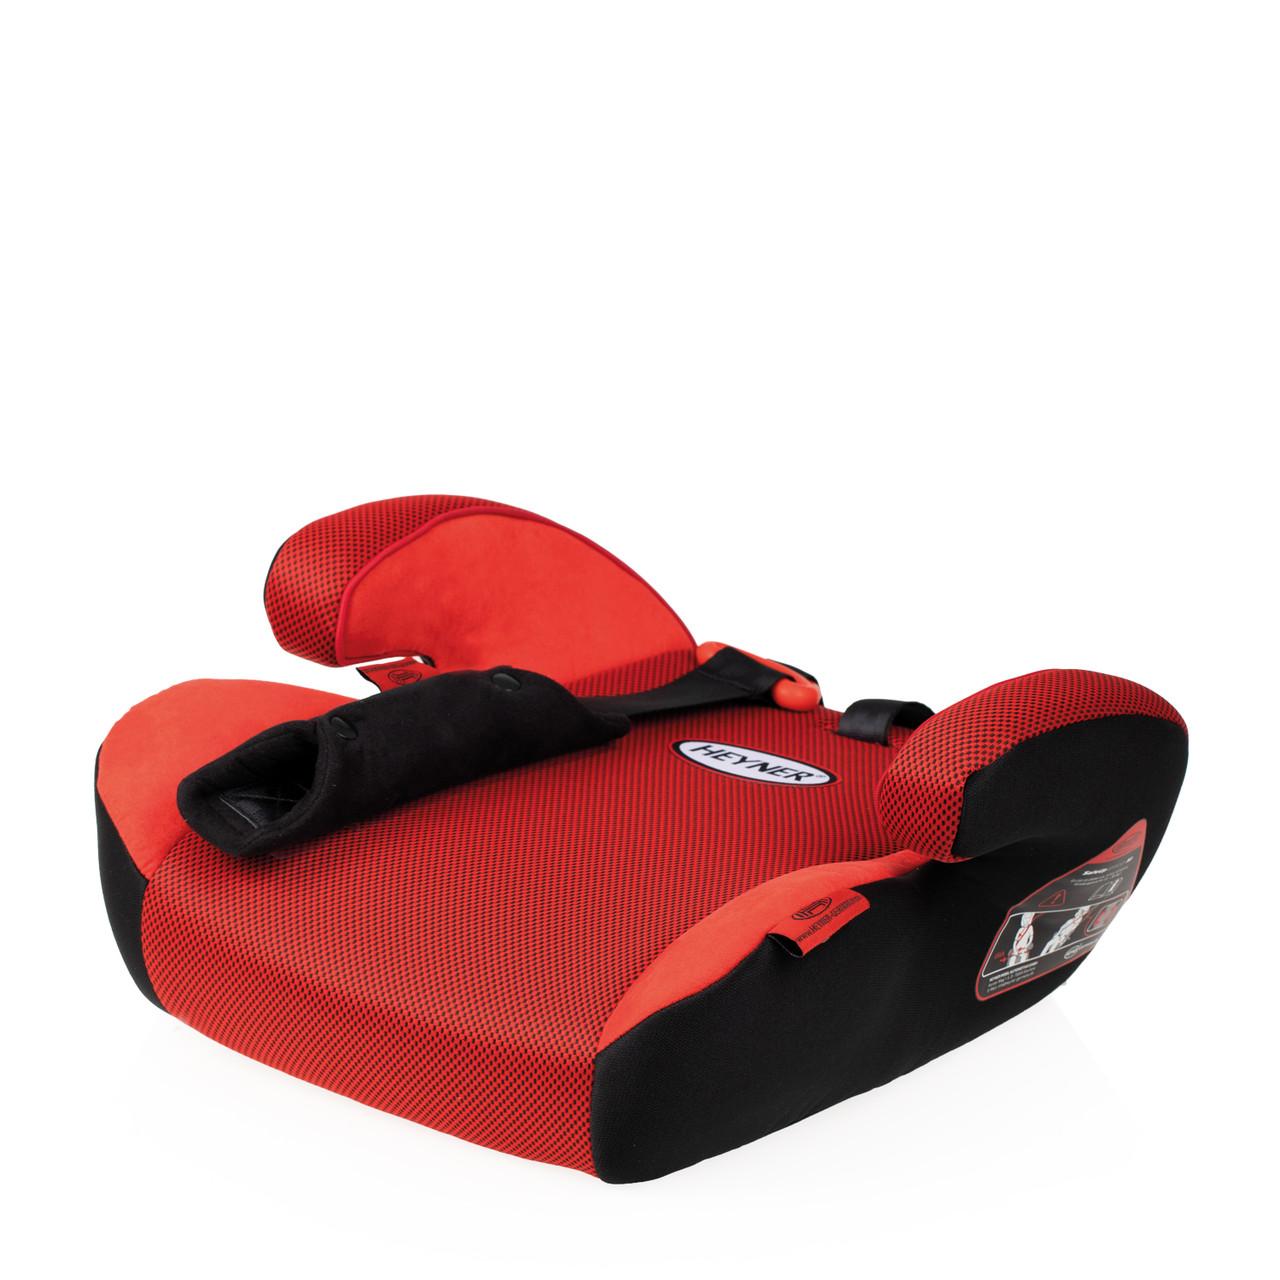 Автокресло бустер Heyner SafeUp ERGO M (II,III)  Racing Red 794 300